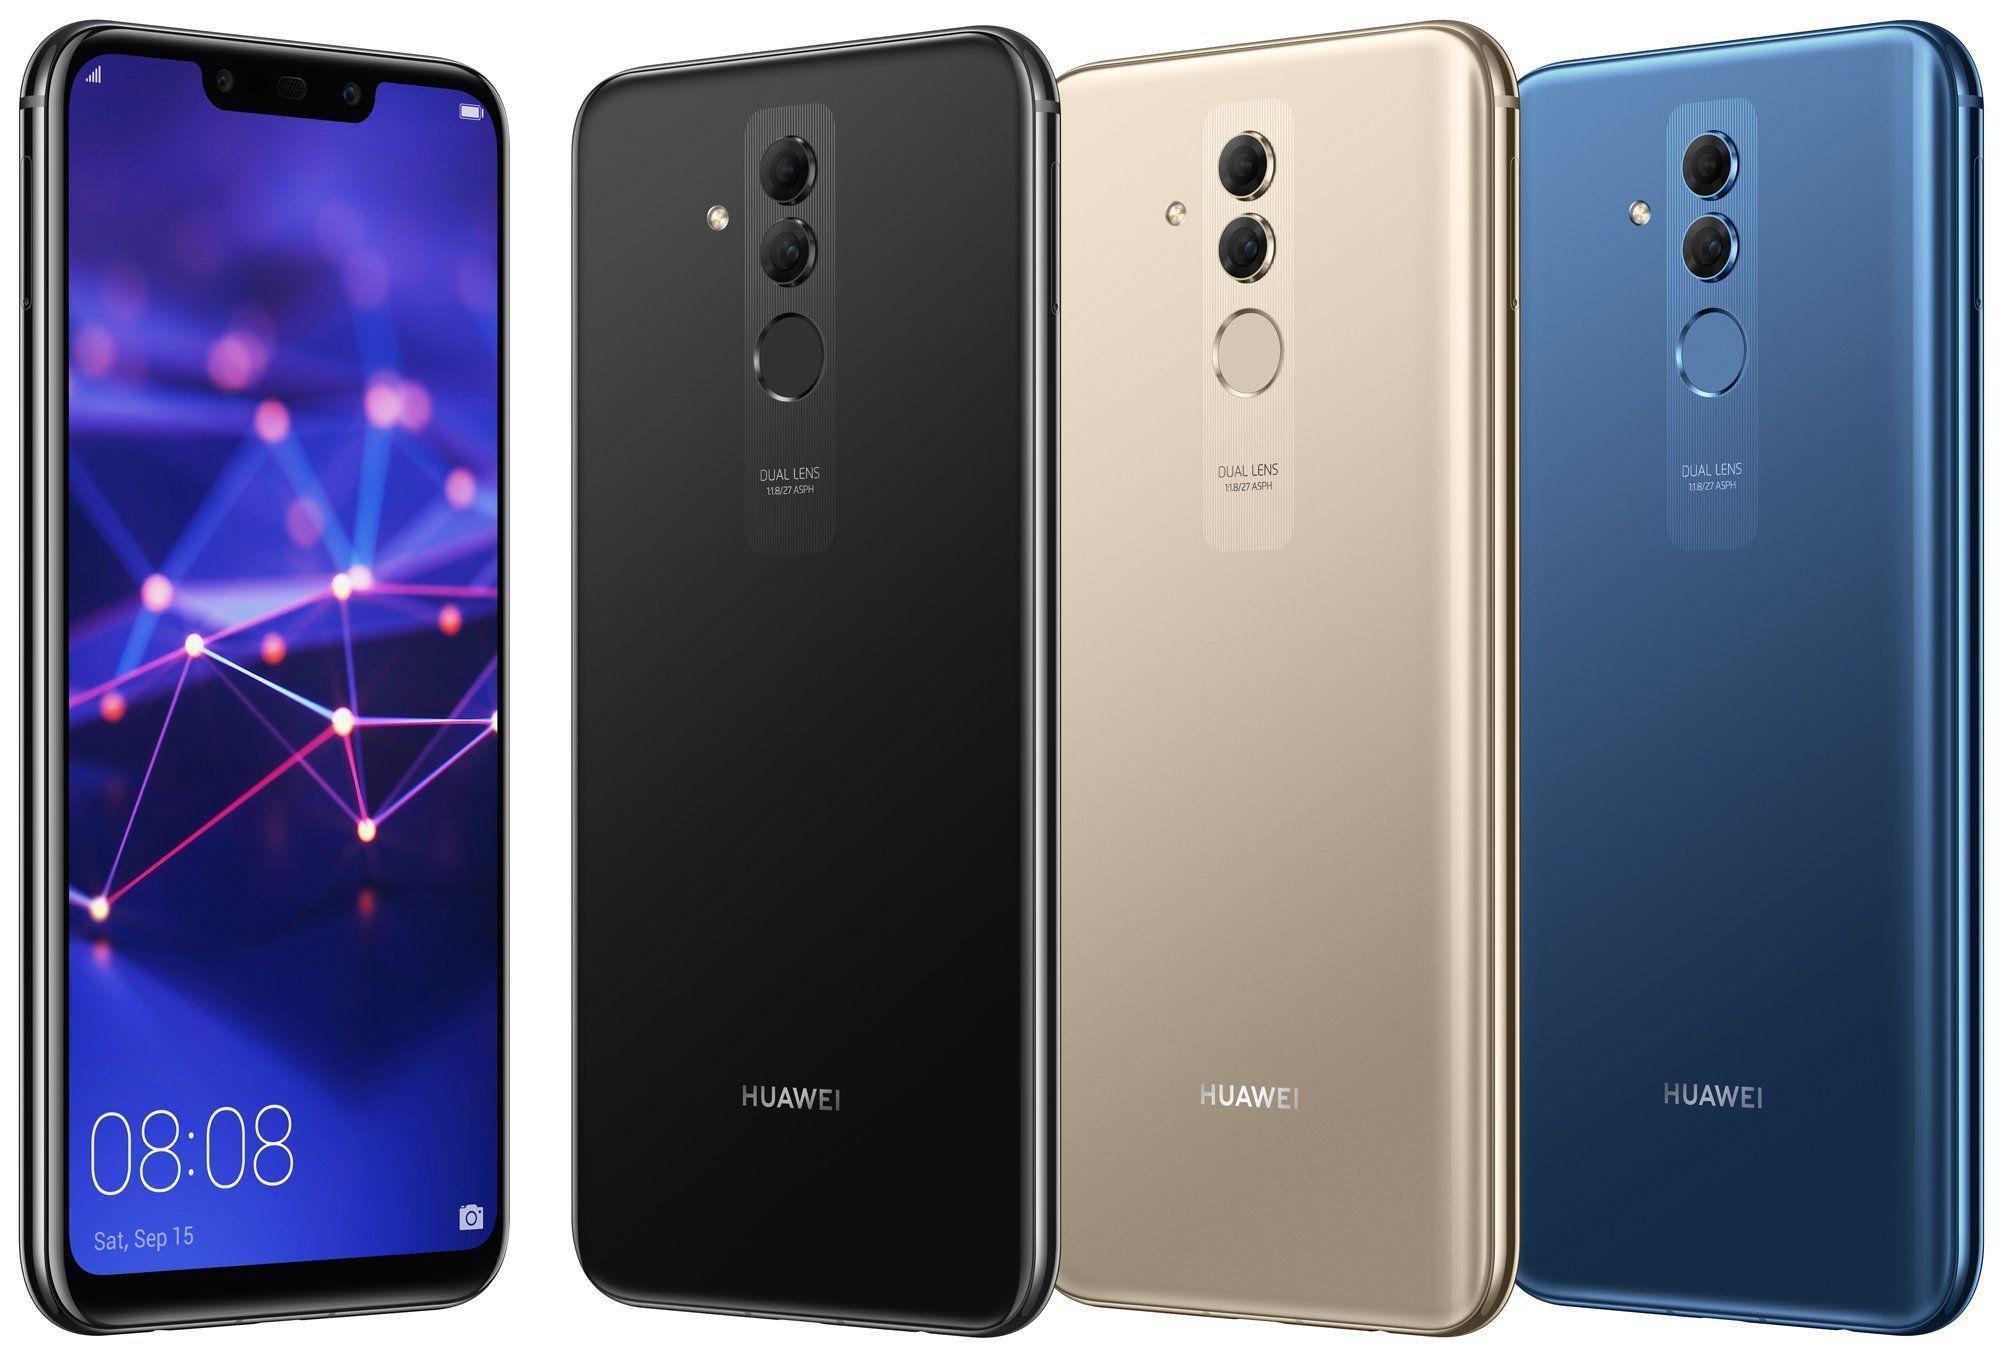 صورة رسمية مسربة جديدة تستعرض لنا الهاتف Huawei Mate 20 Lite بثلاث ألوان مختلفة Prepaid Phones Phone Smartphone